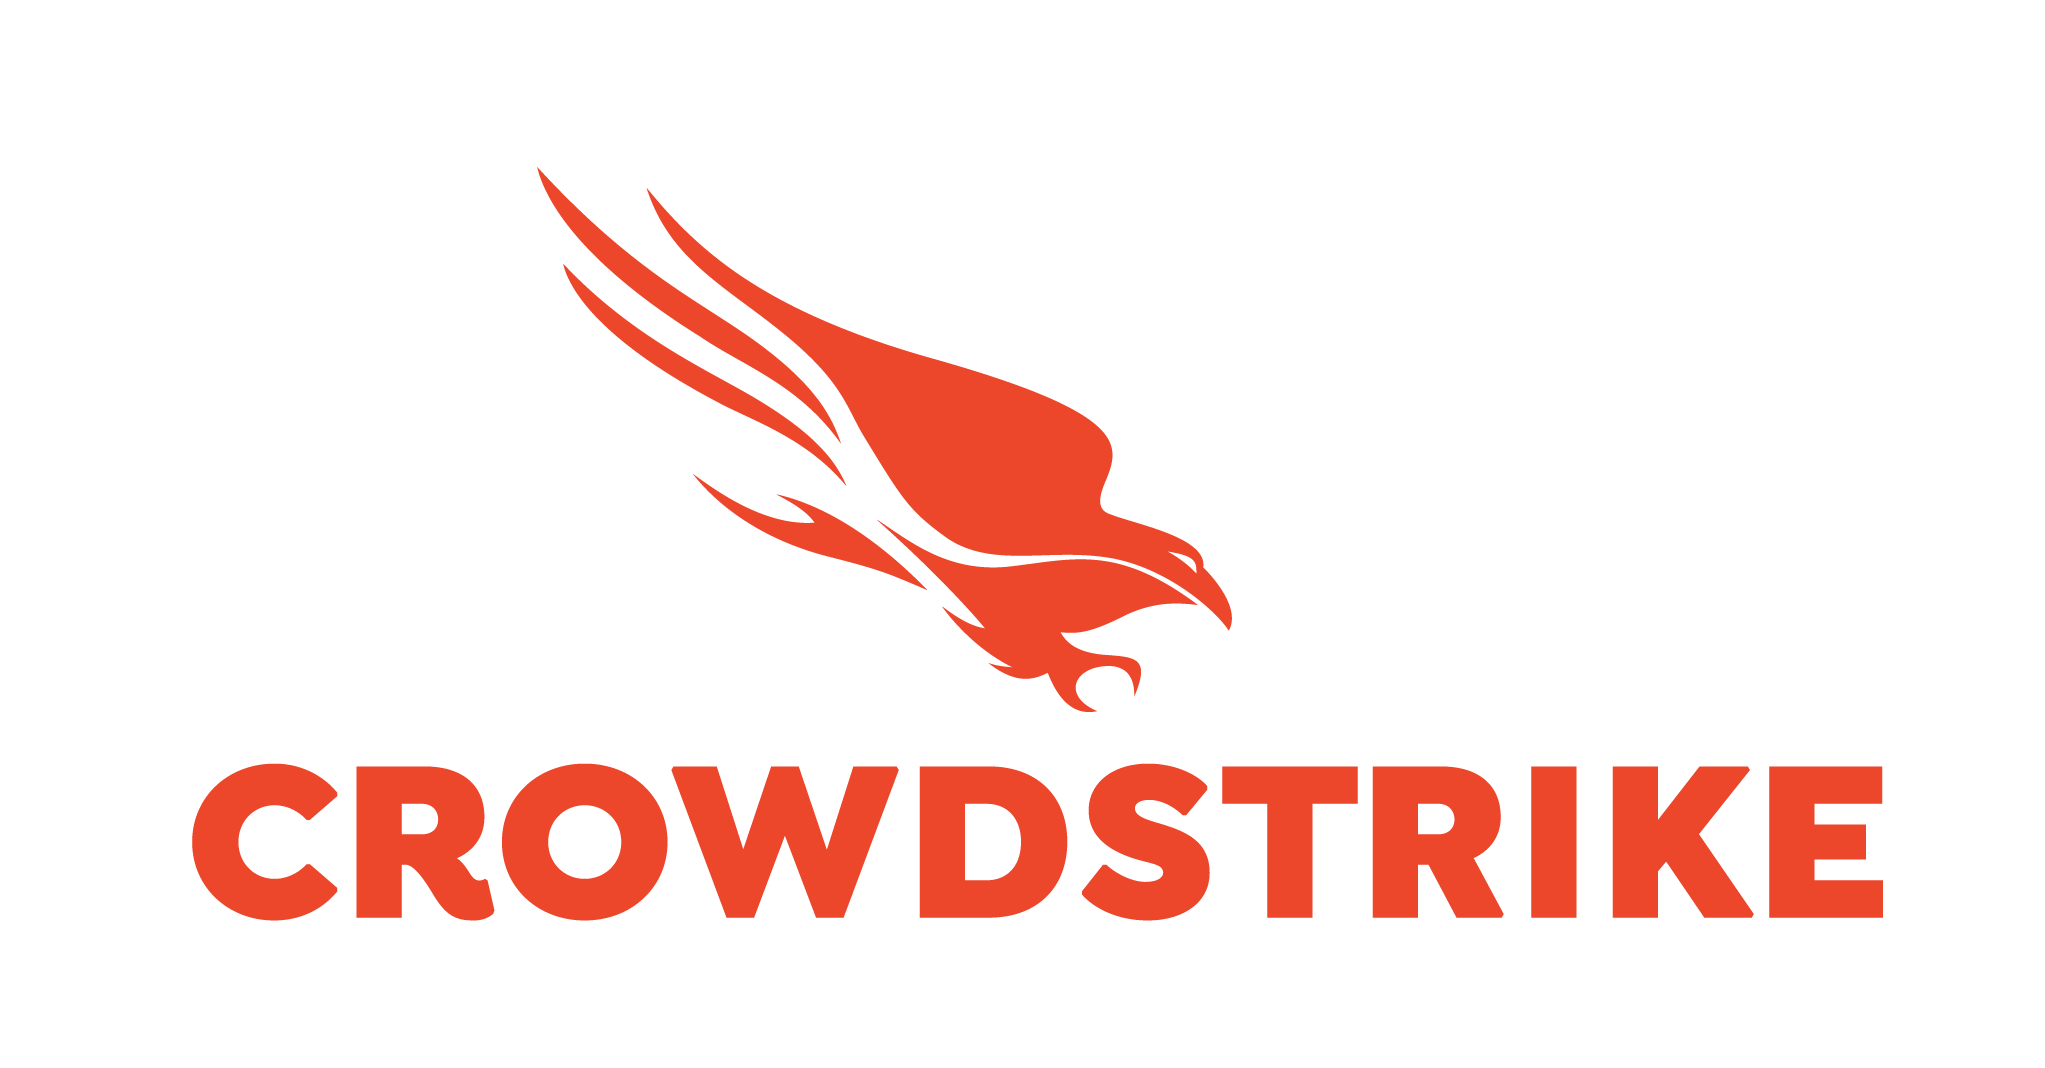 Image of crowdstrike logo